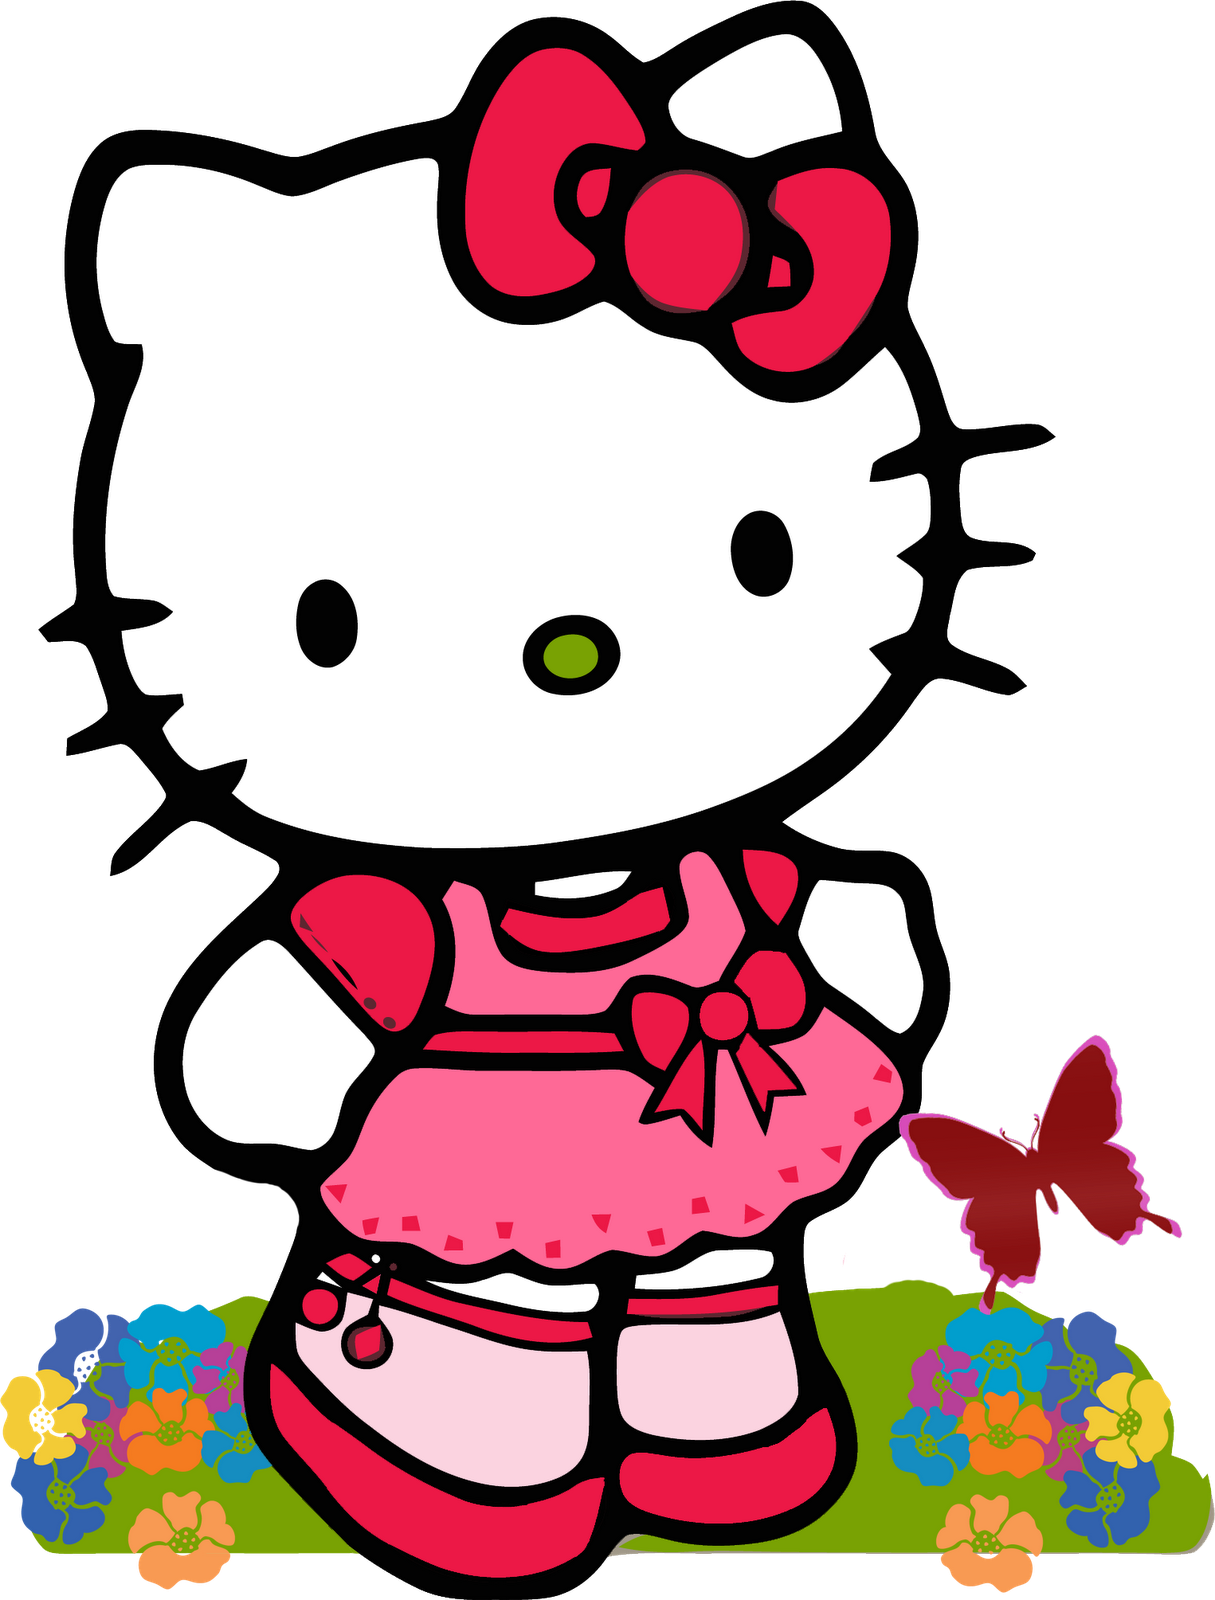 Kumpulan Gambar Hello Kitty  Gambar Lucu Terbaru Cartoon Animation Pictures